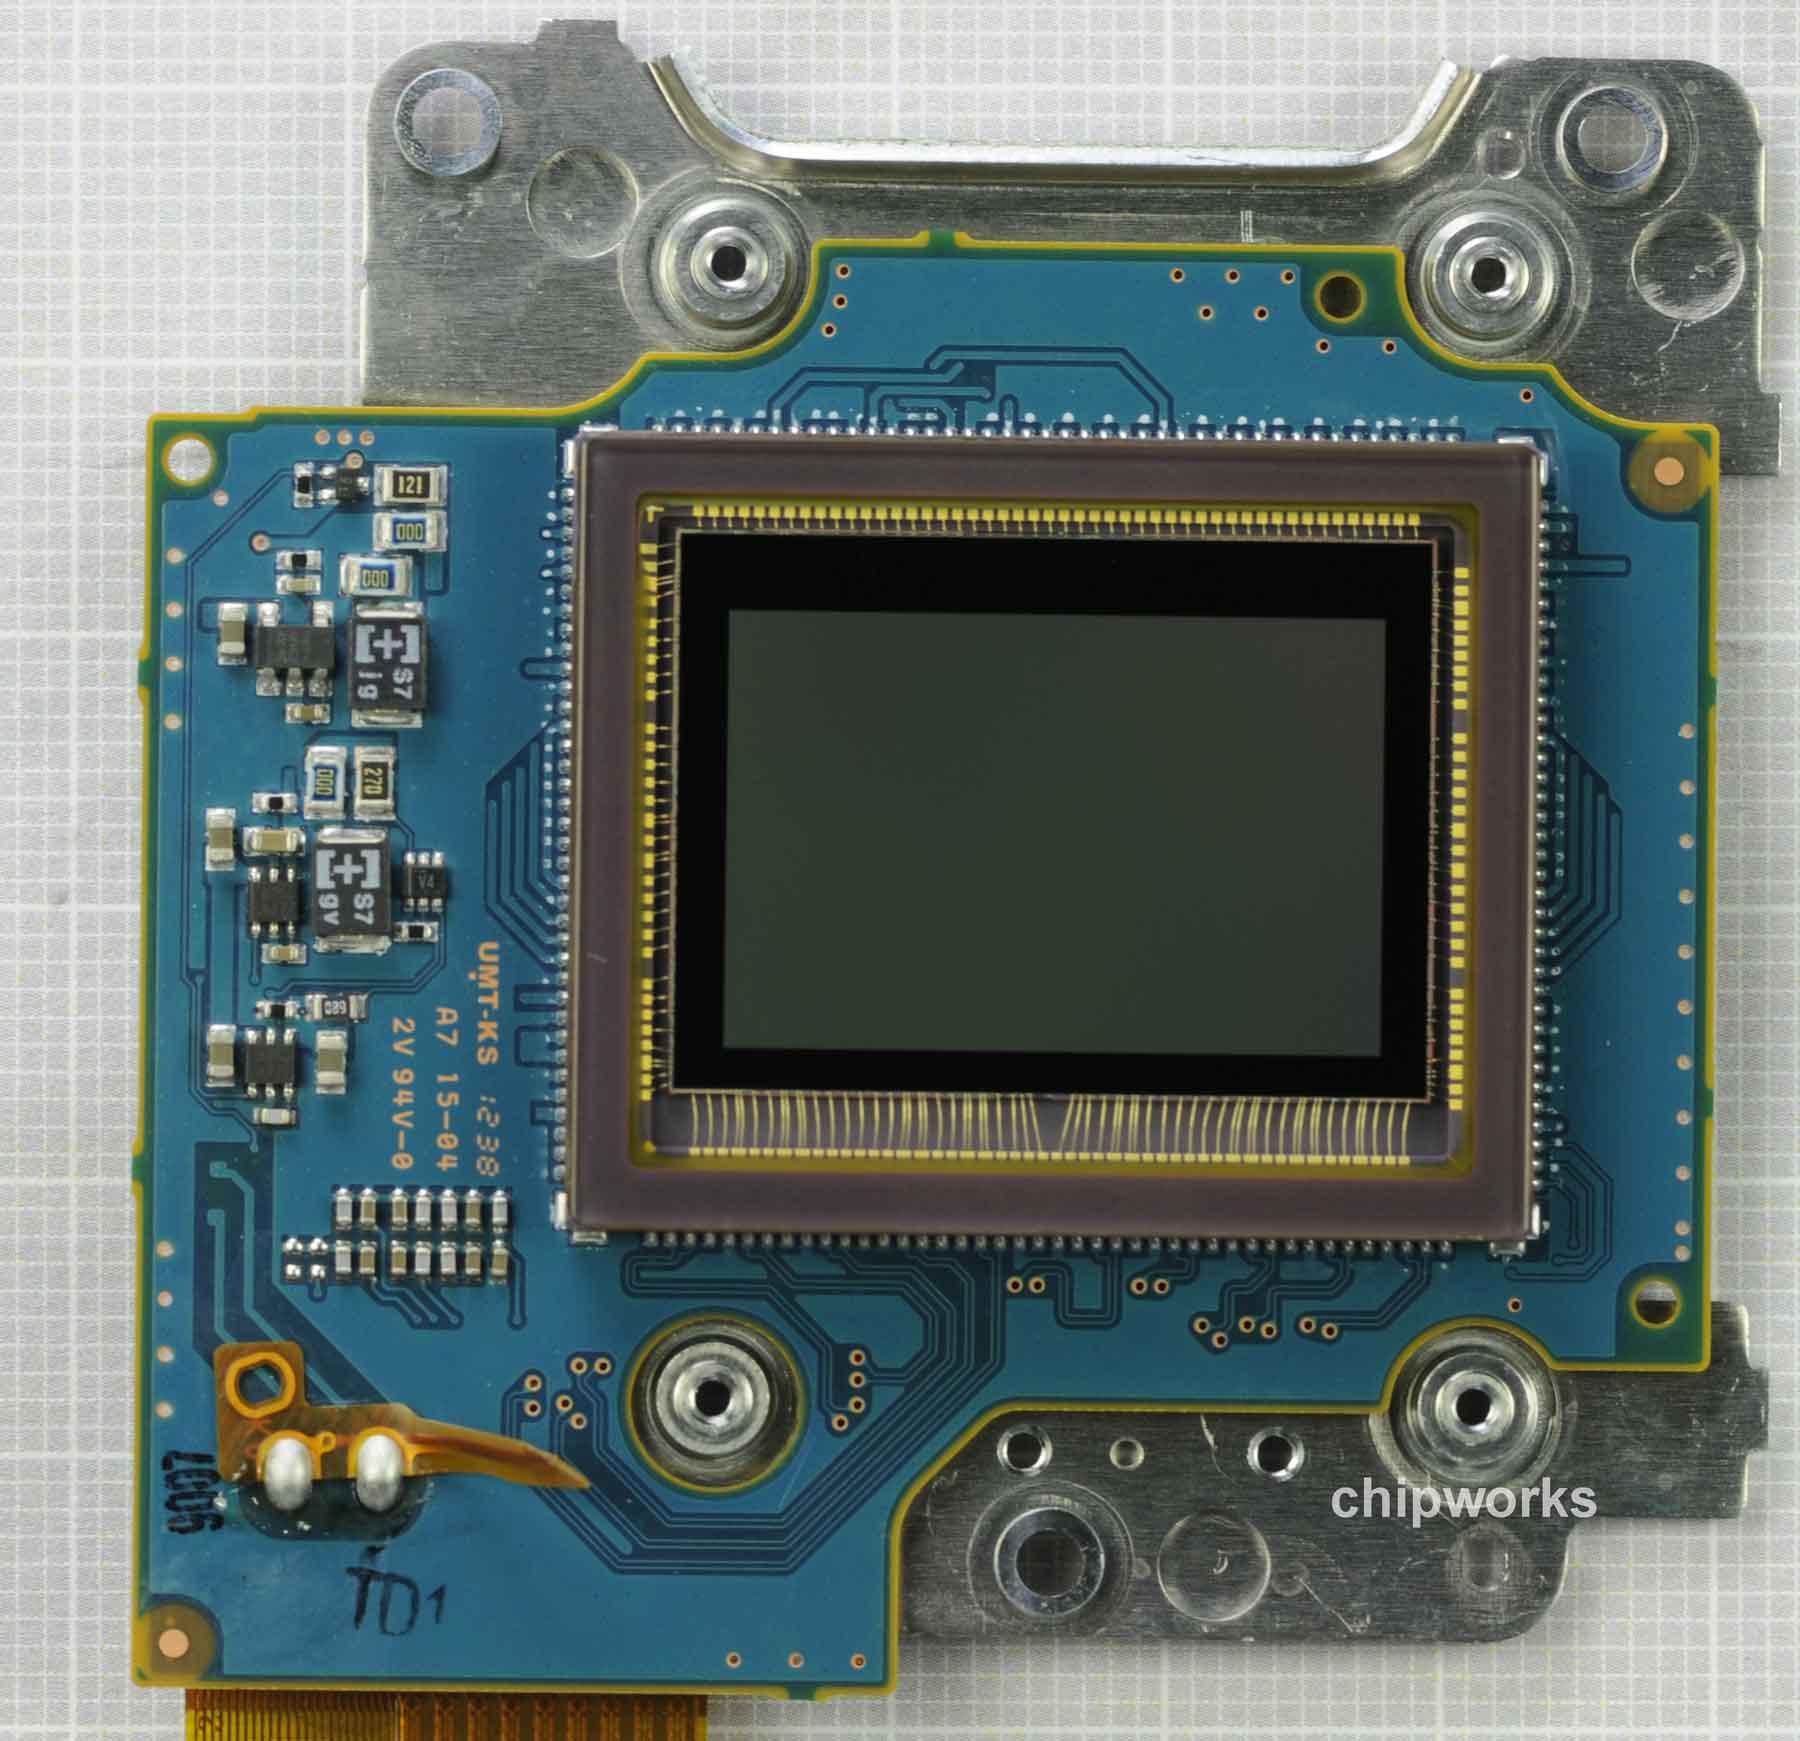 Nikon D5200 Sensor Made by Toshiba